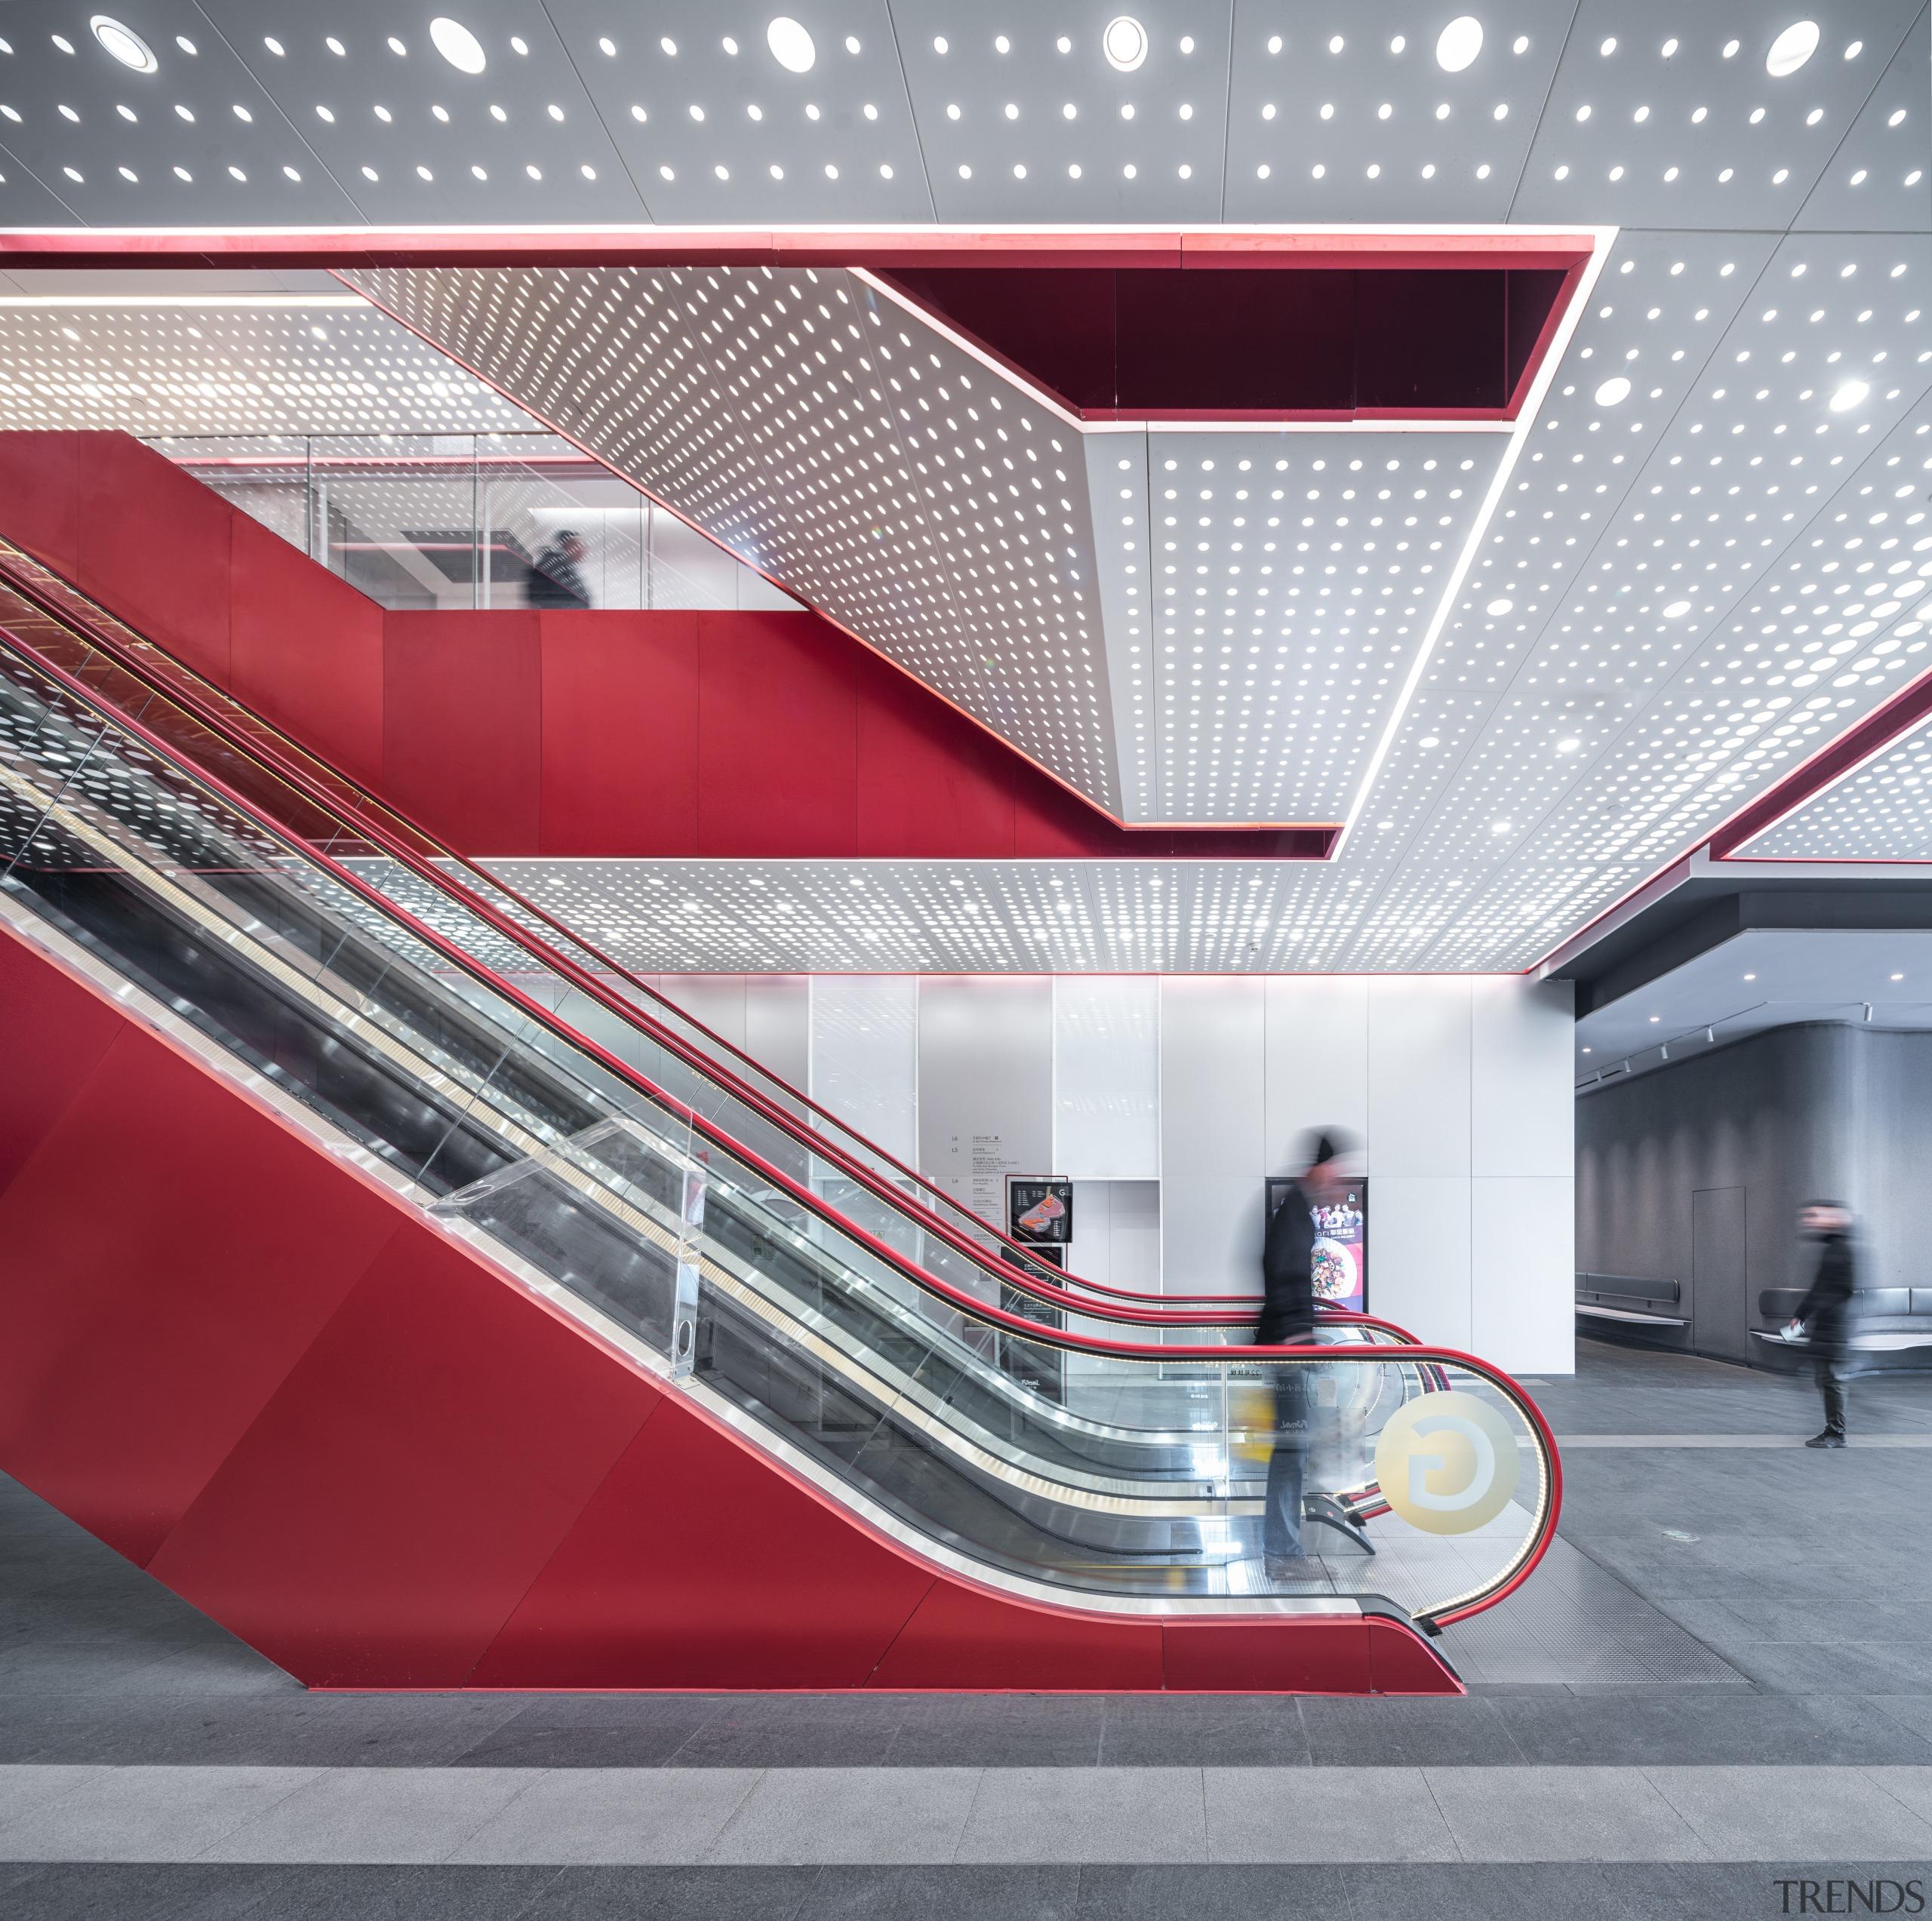 Shanghai's Shimao Festival City mall has high-profile escalators architecture, building, escalator, interior design, Shimao Kokaistudios